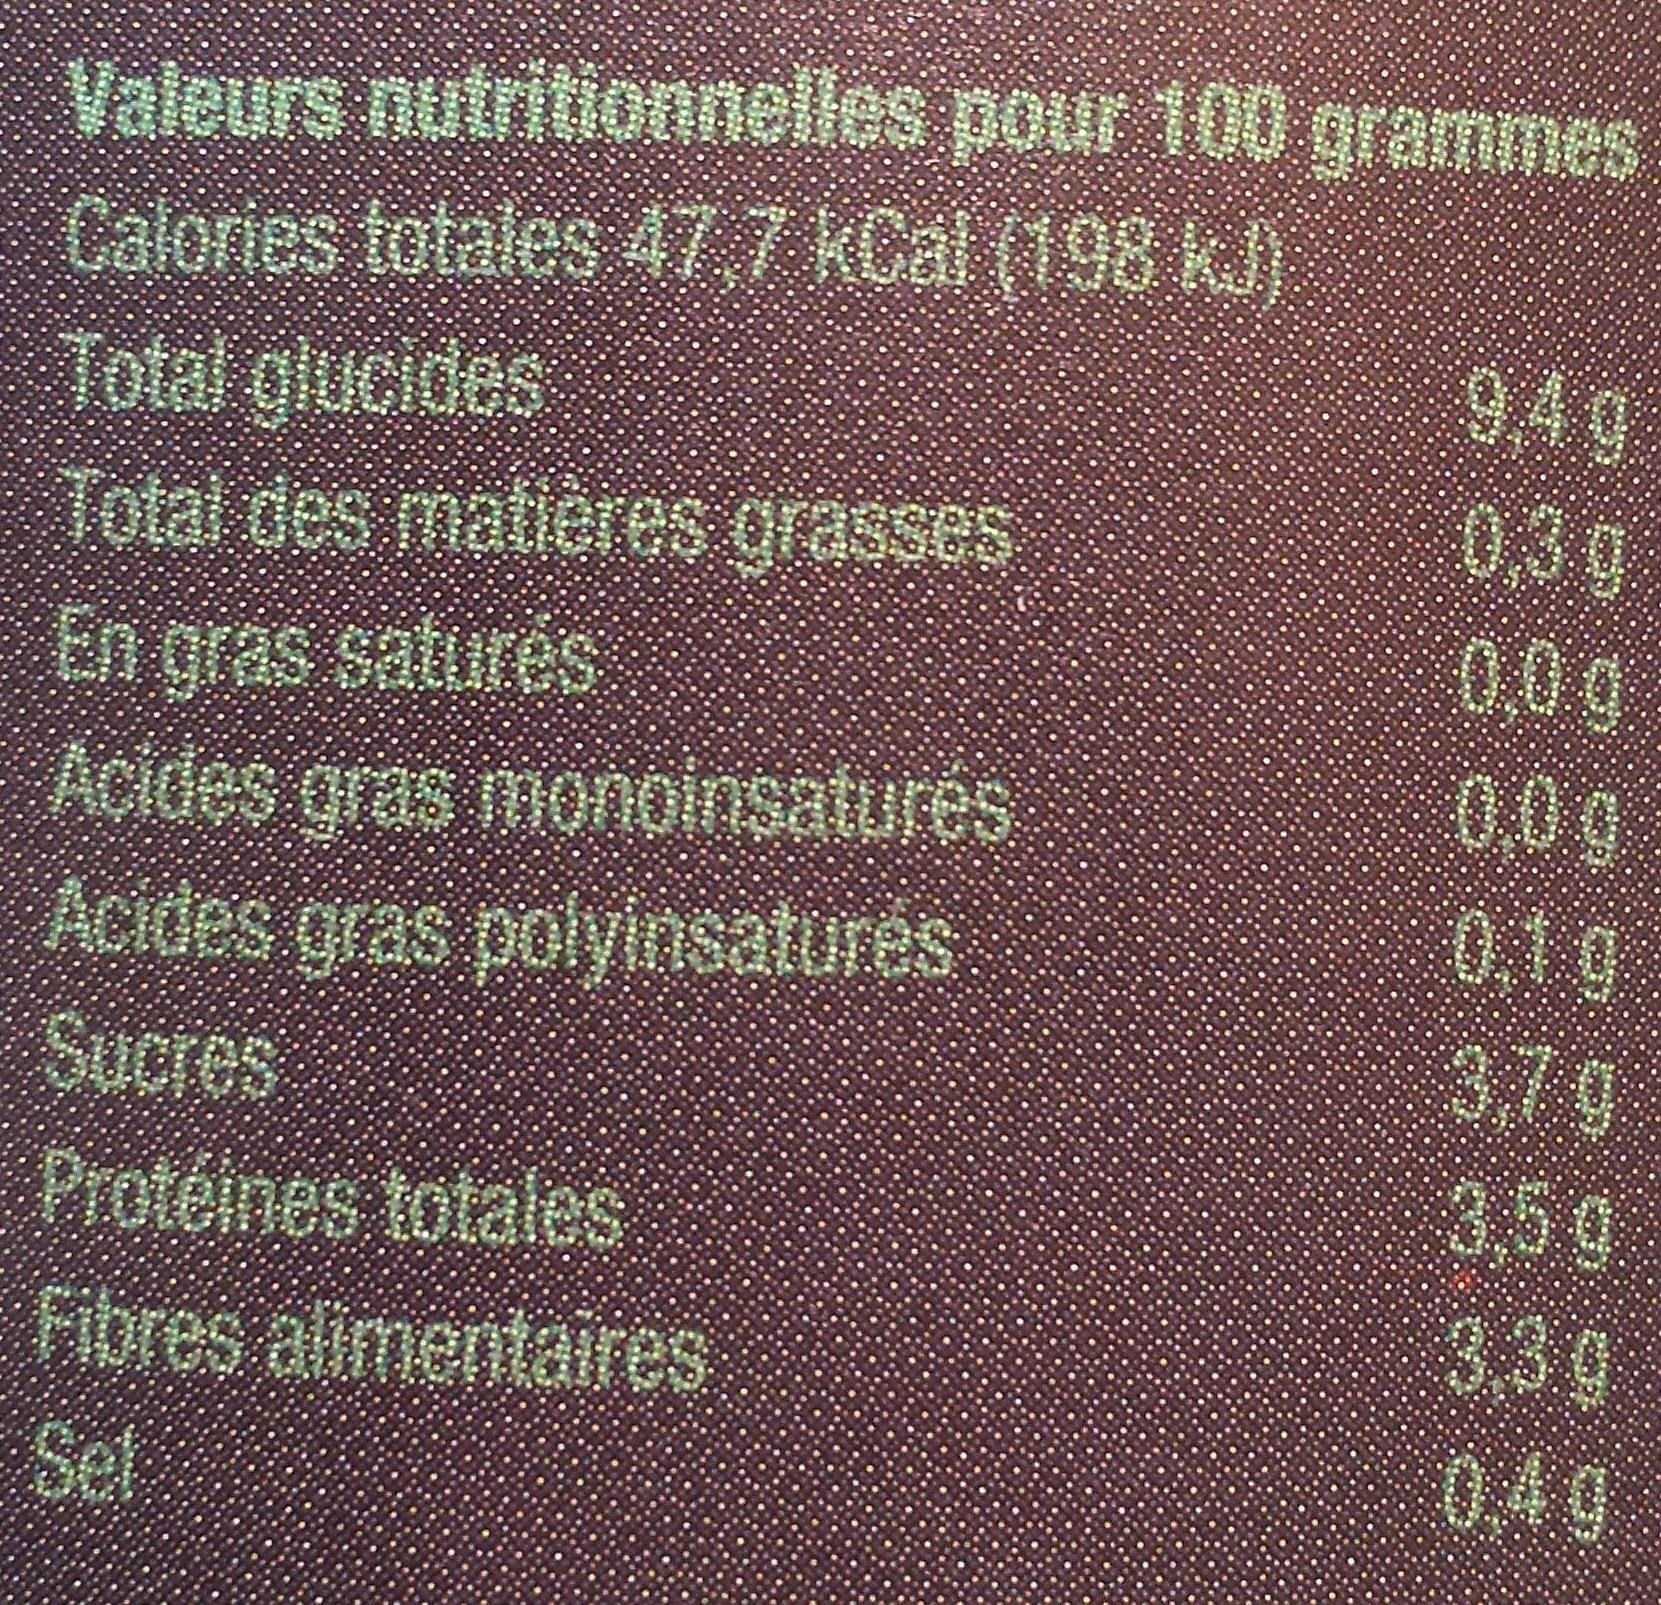 Petits pois bio - Nutrition facts - fr